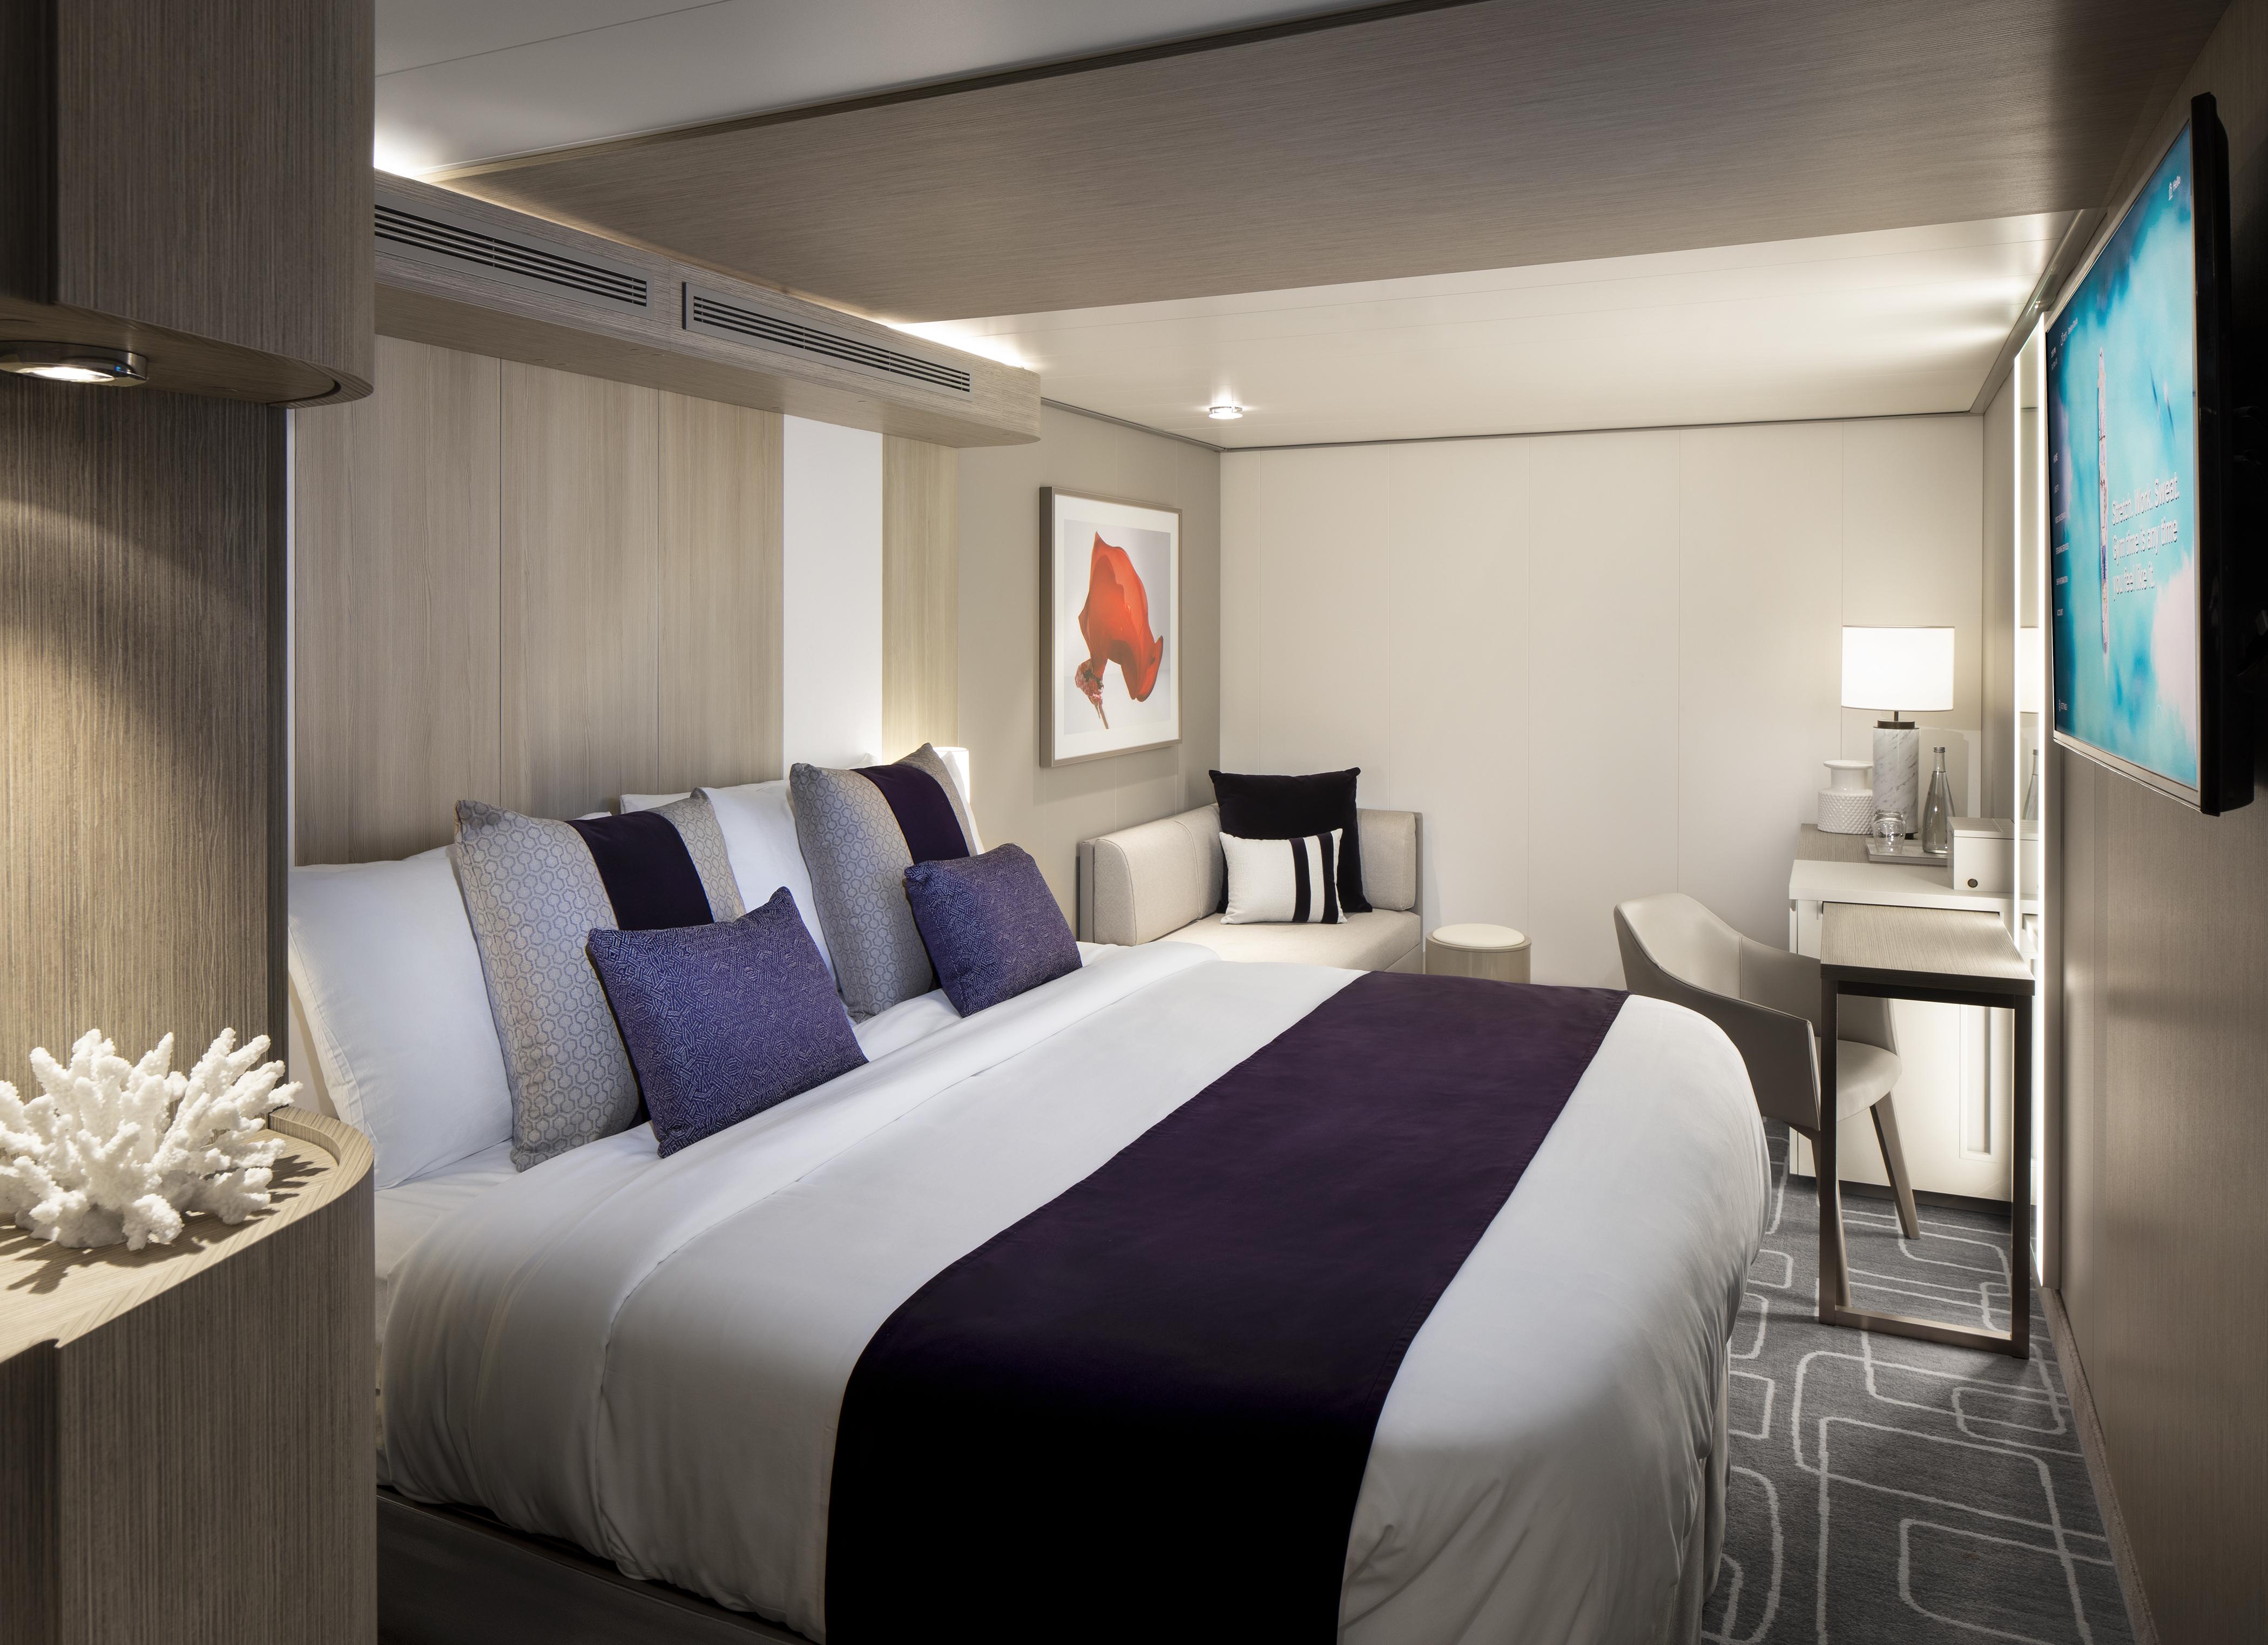 Celebrity Summit Cruise Ship 2019 Amp 2020 Cruise Deals